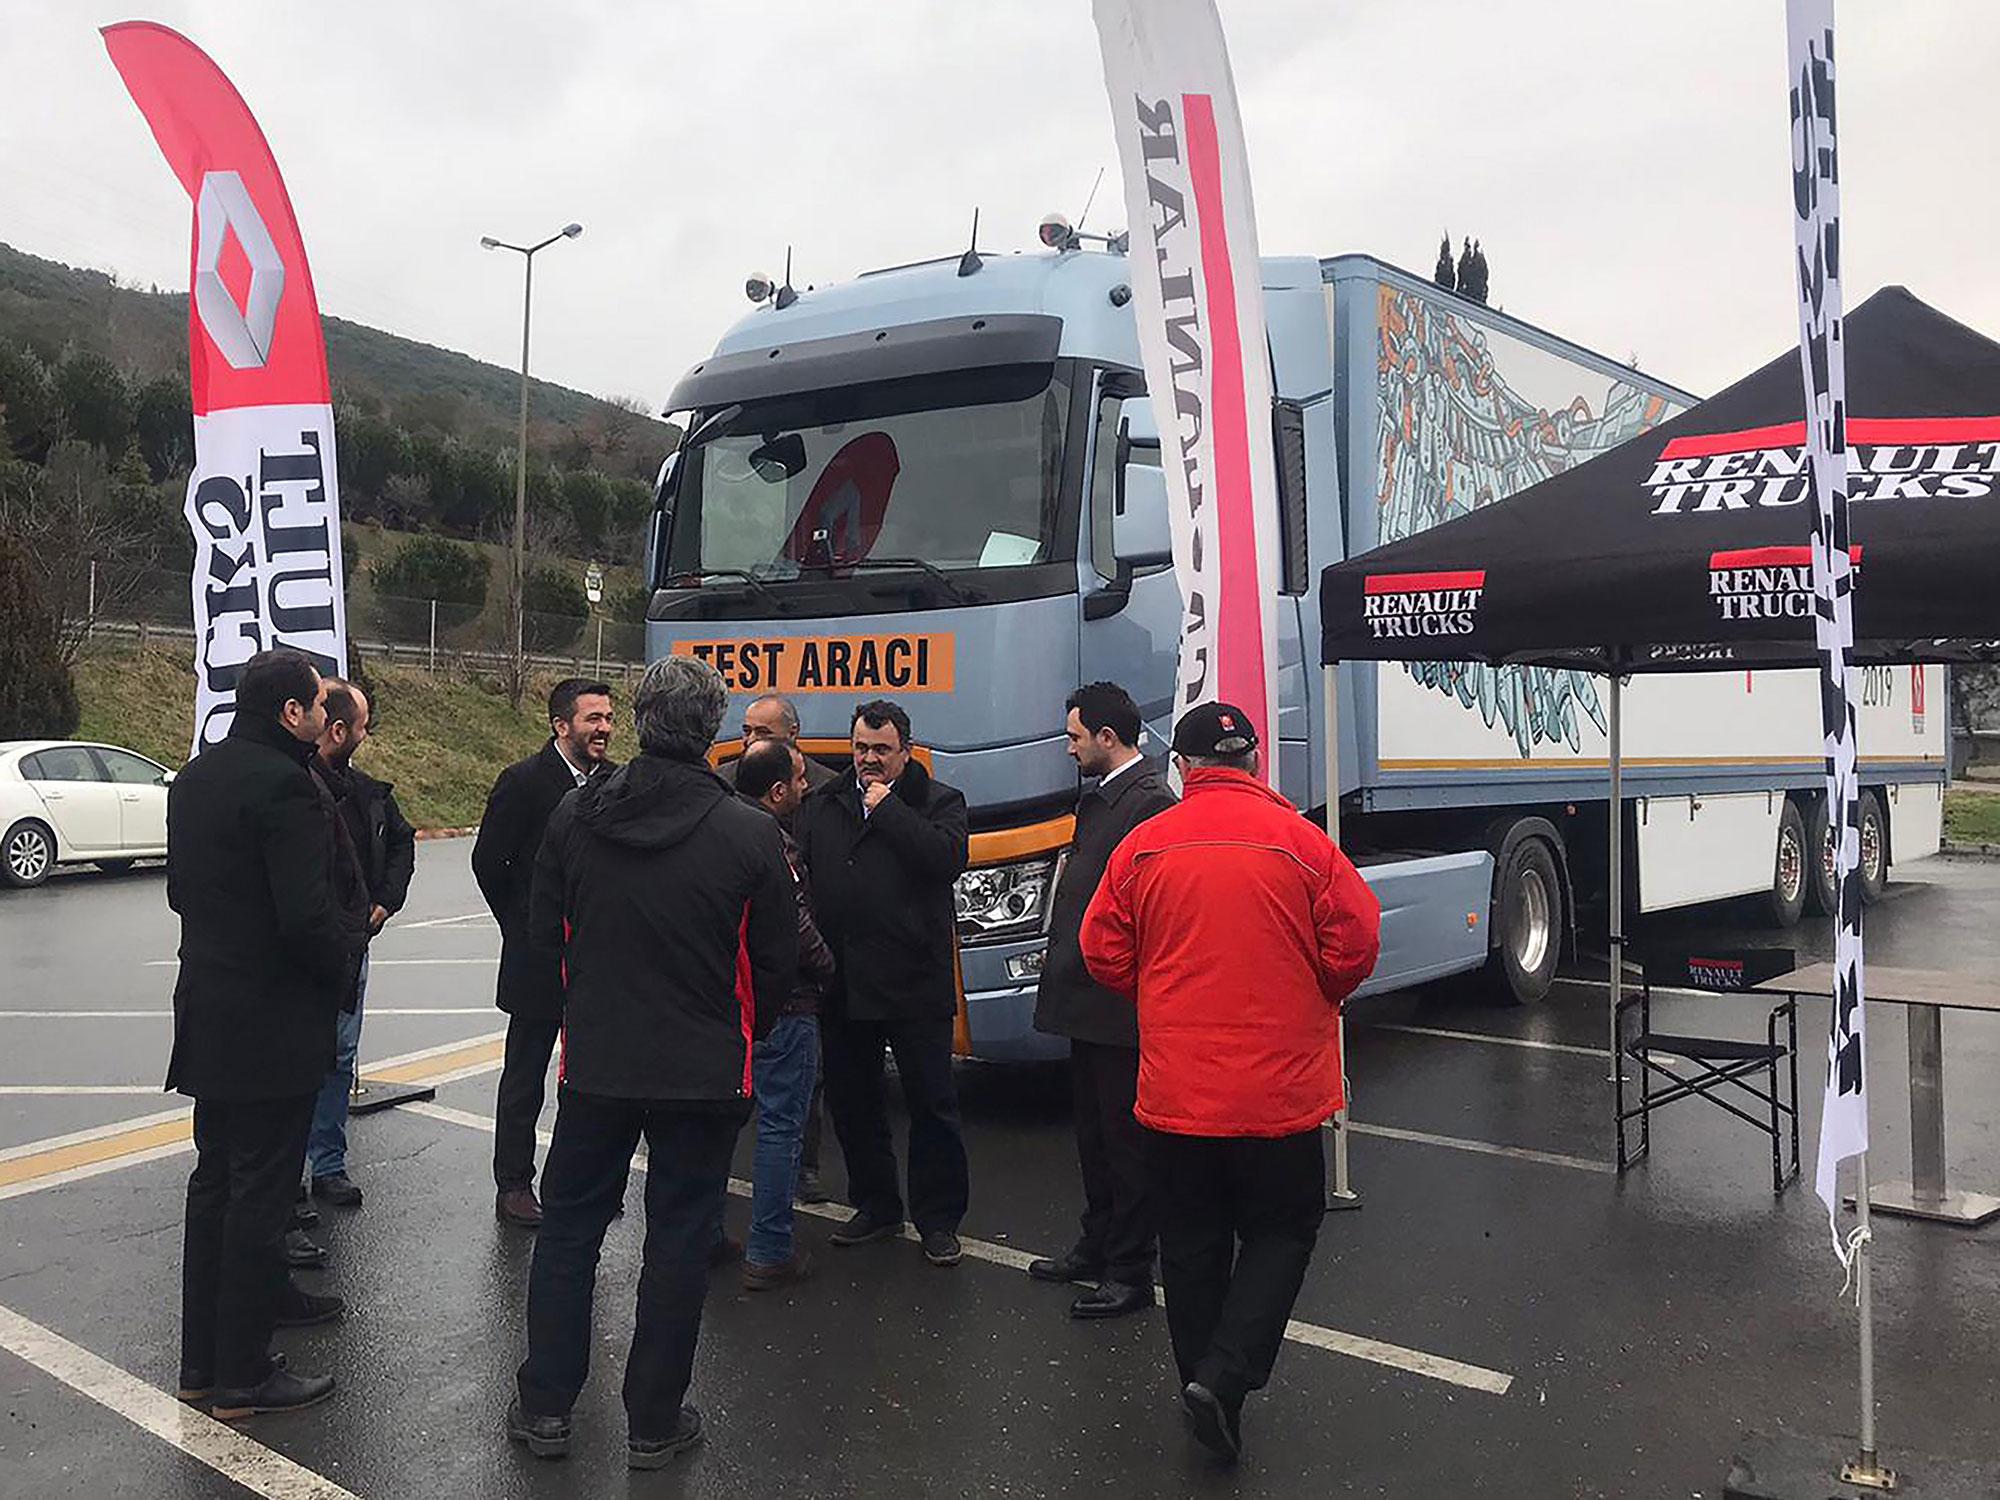 renault-trucks_road-show_-001.jpg